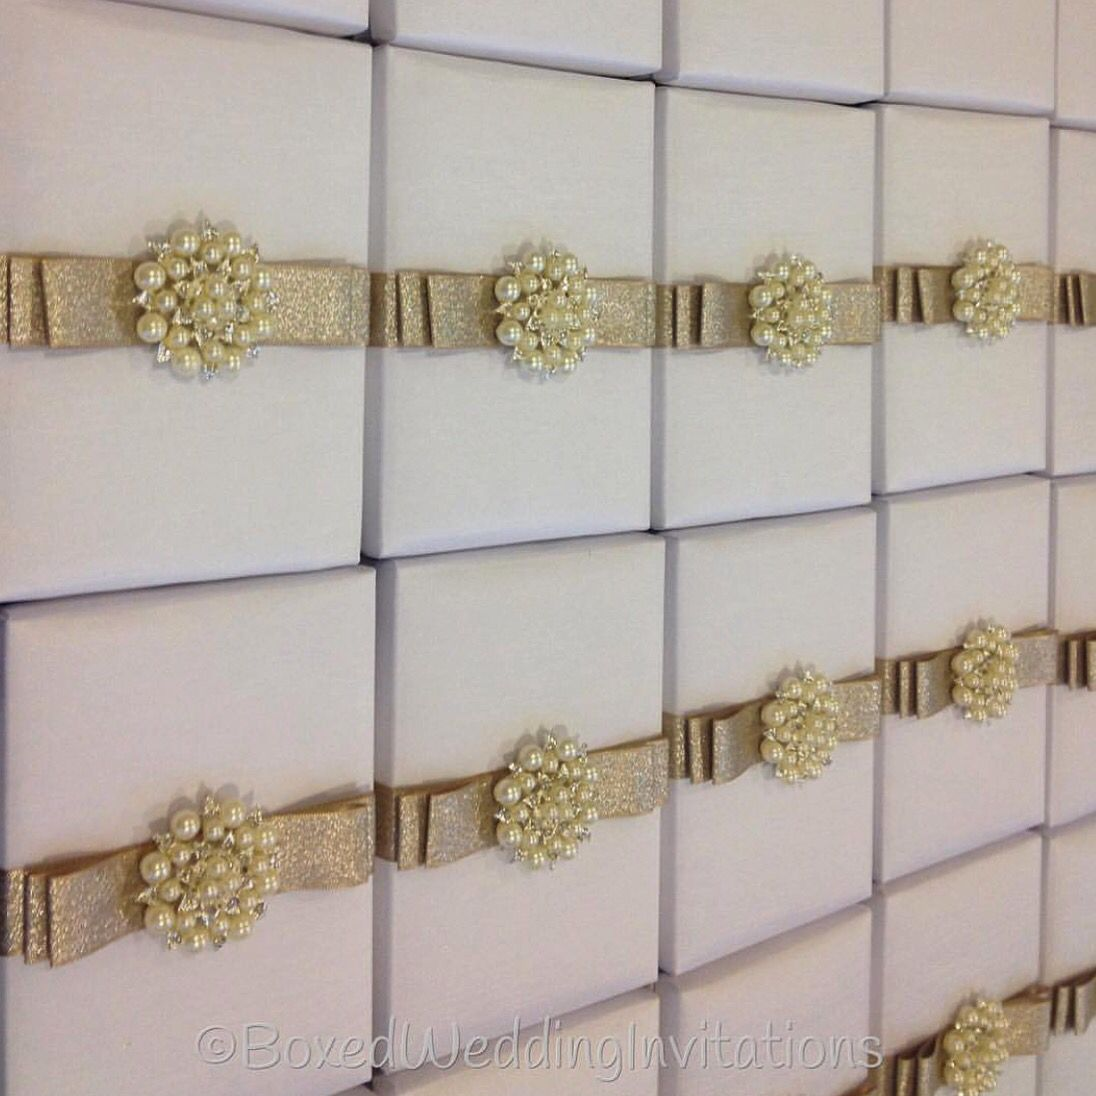 ✨✨✨So sparkling!!! White silk invitation box adorned with gold ...